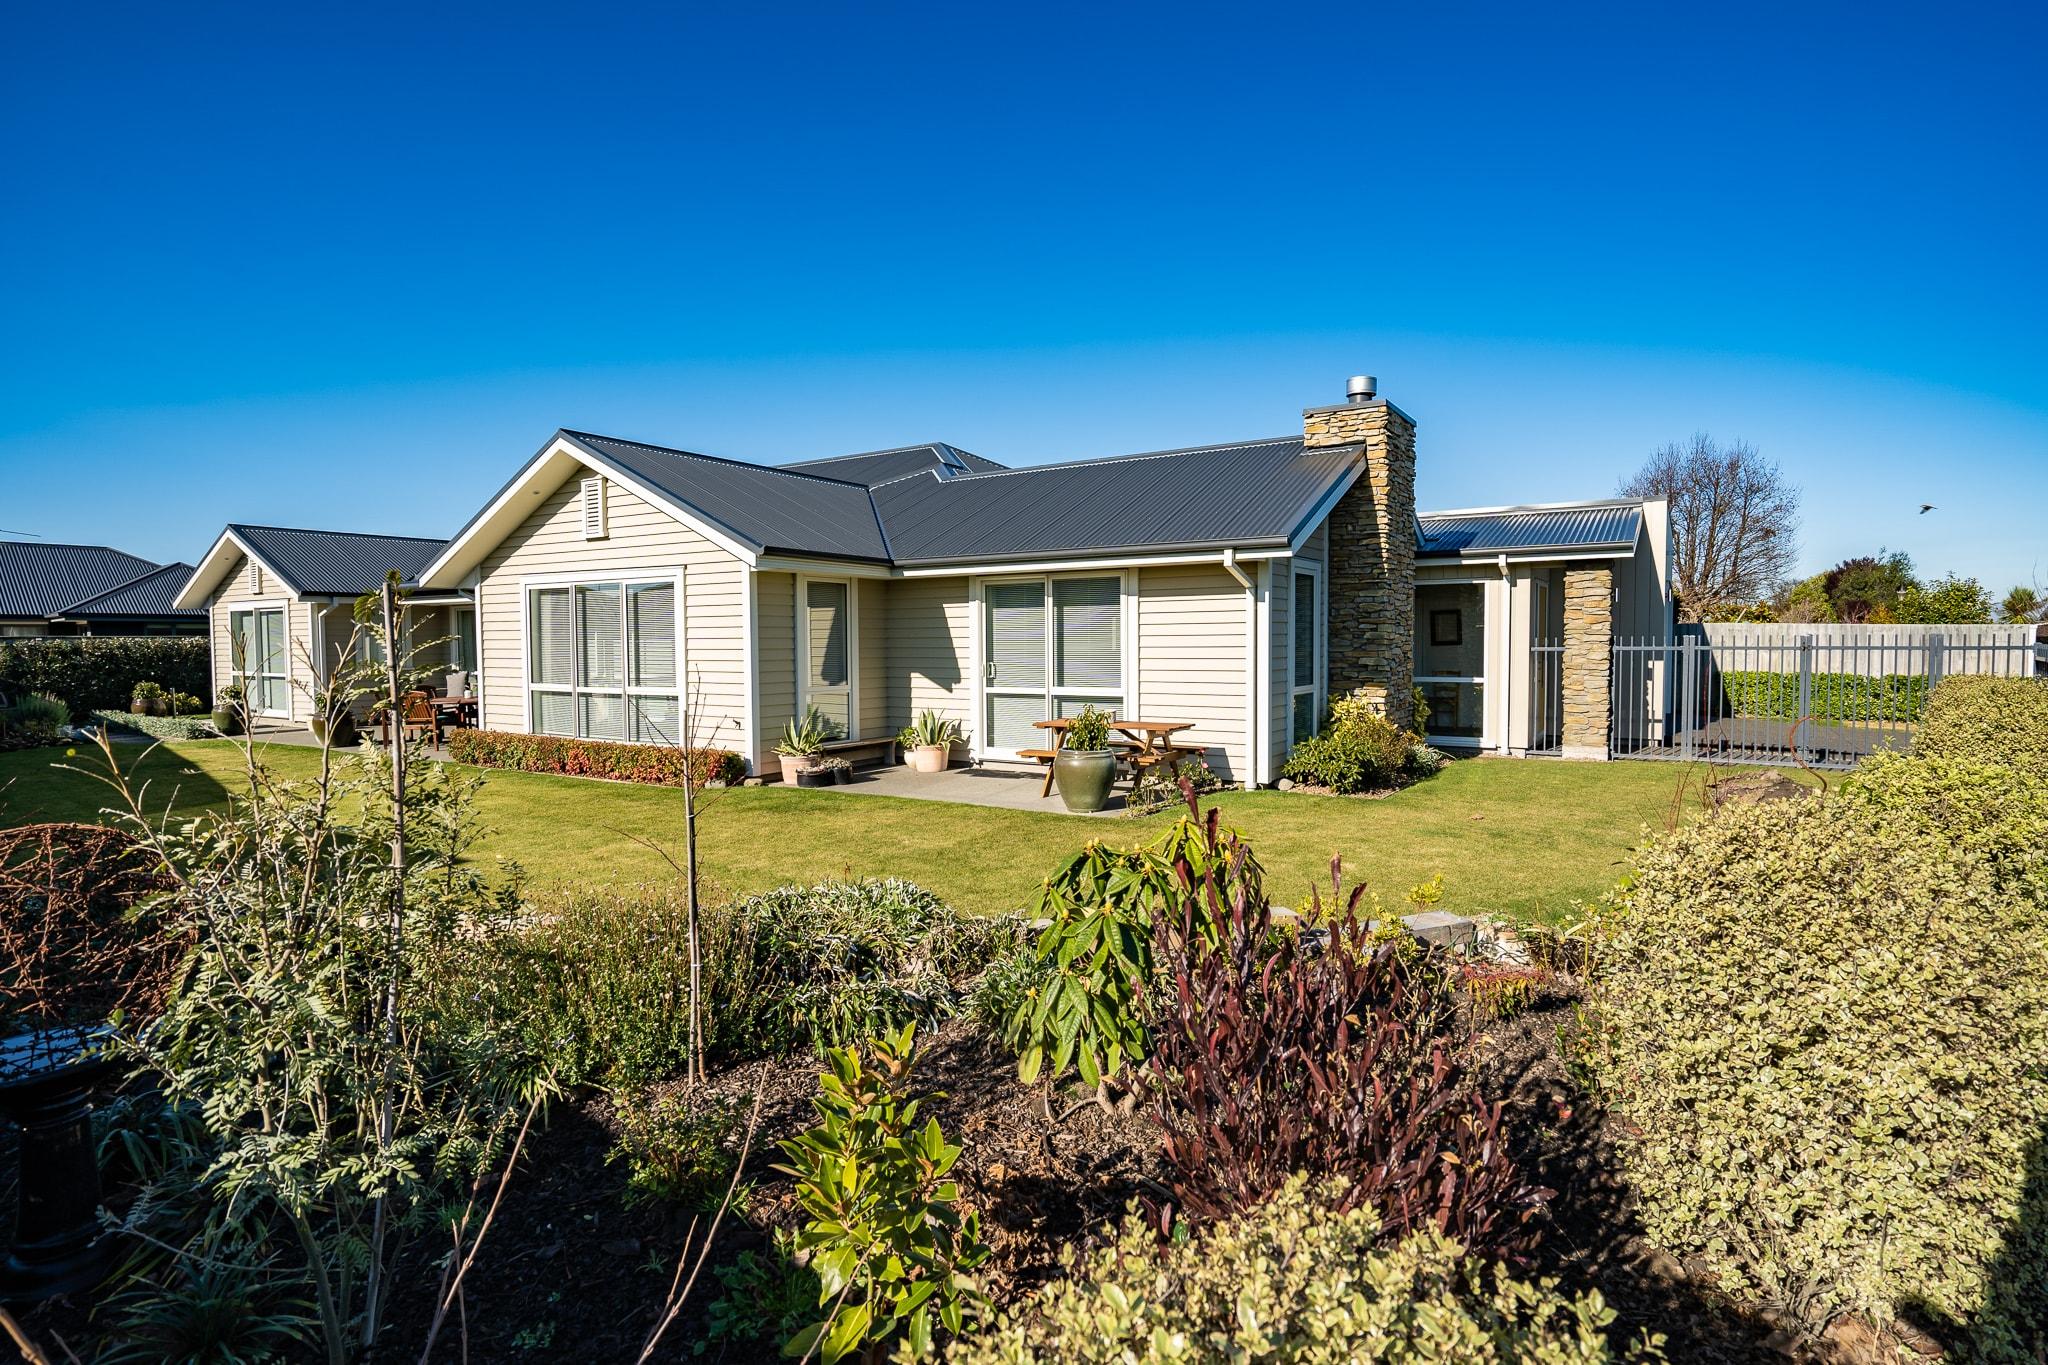 robertson_building_canterbury_ltd_ballarat_small_20-min.jpg